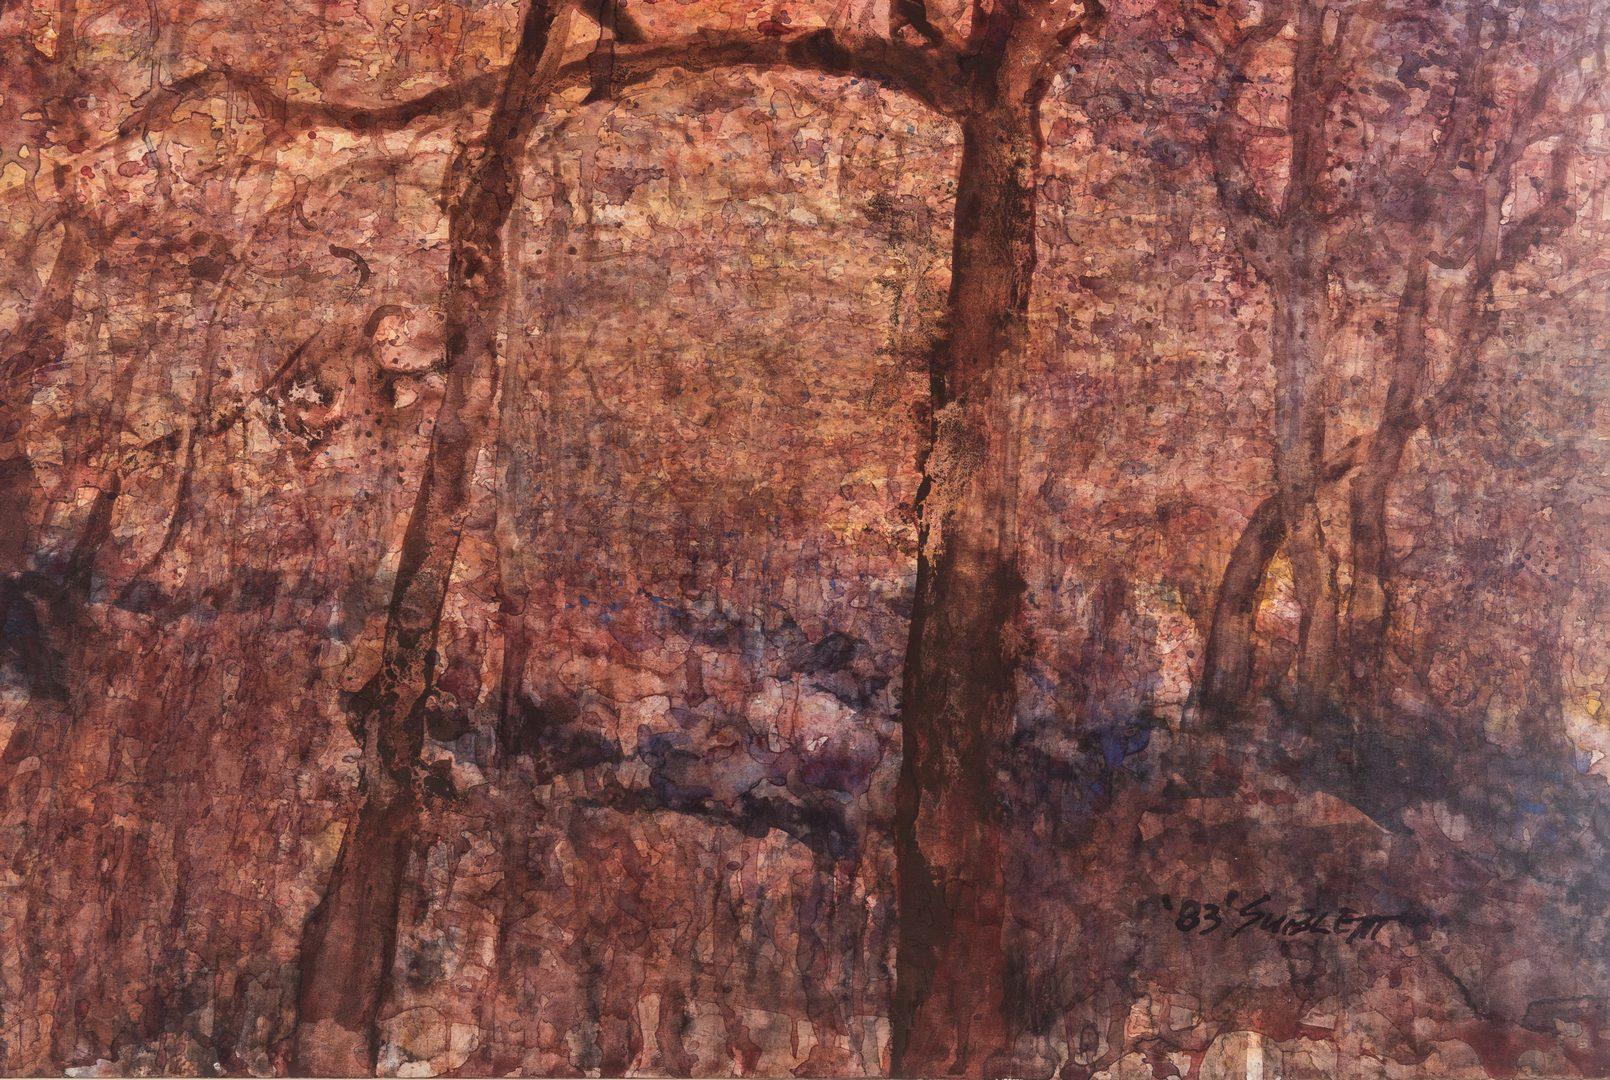 Lot 426: Carl Sublett Watercolor Landscape, Wild Lace